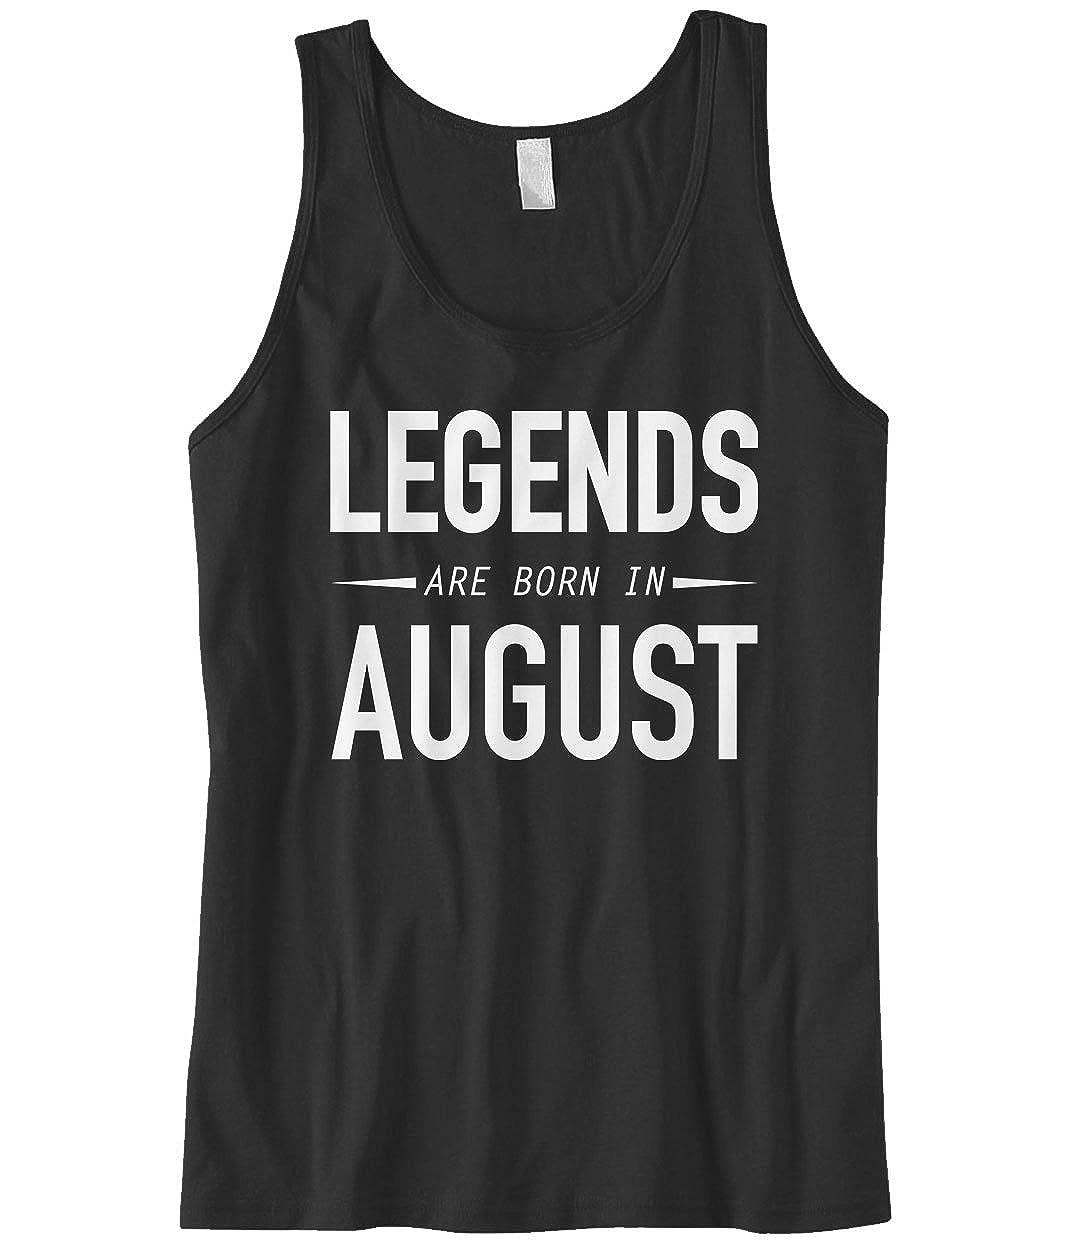 Cybertela Mens Legends are Born in August Tank Top